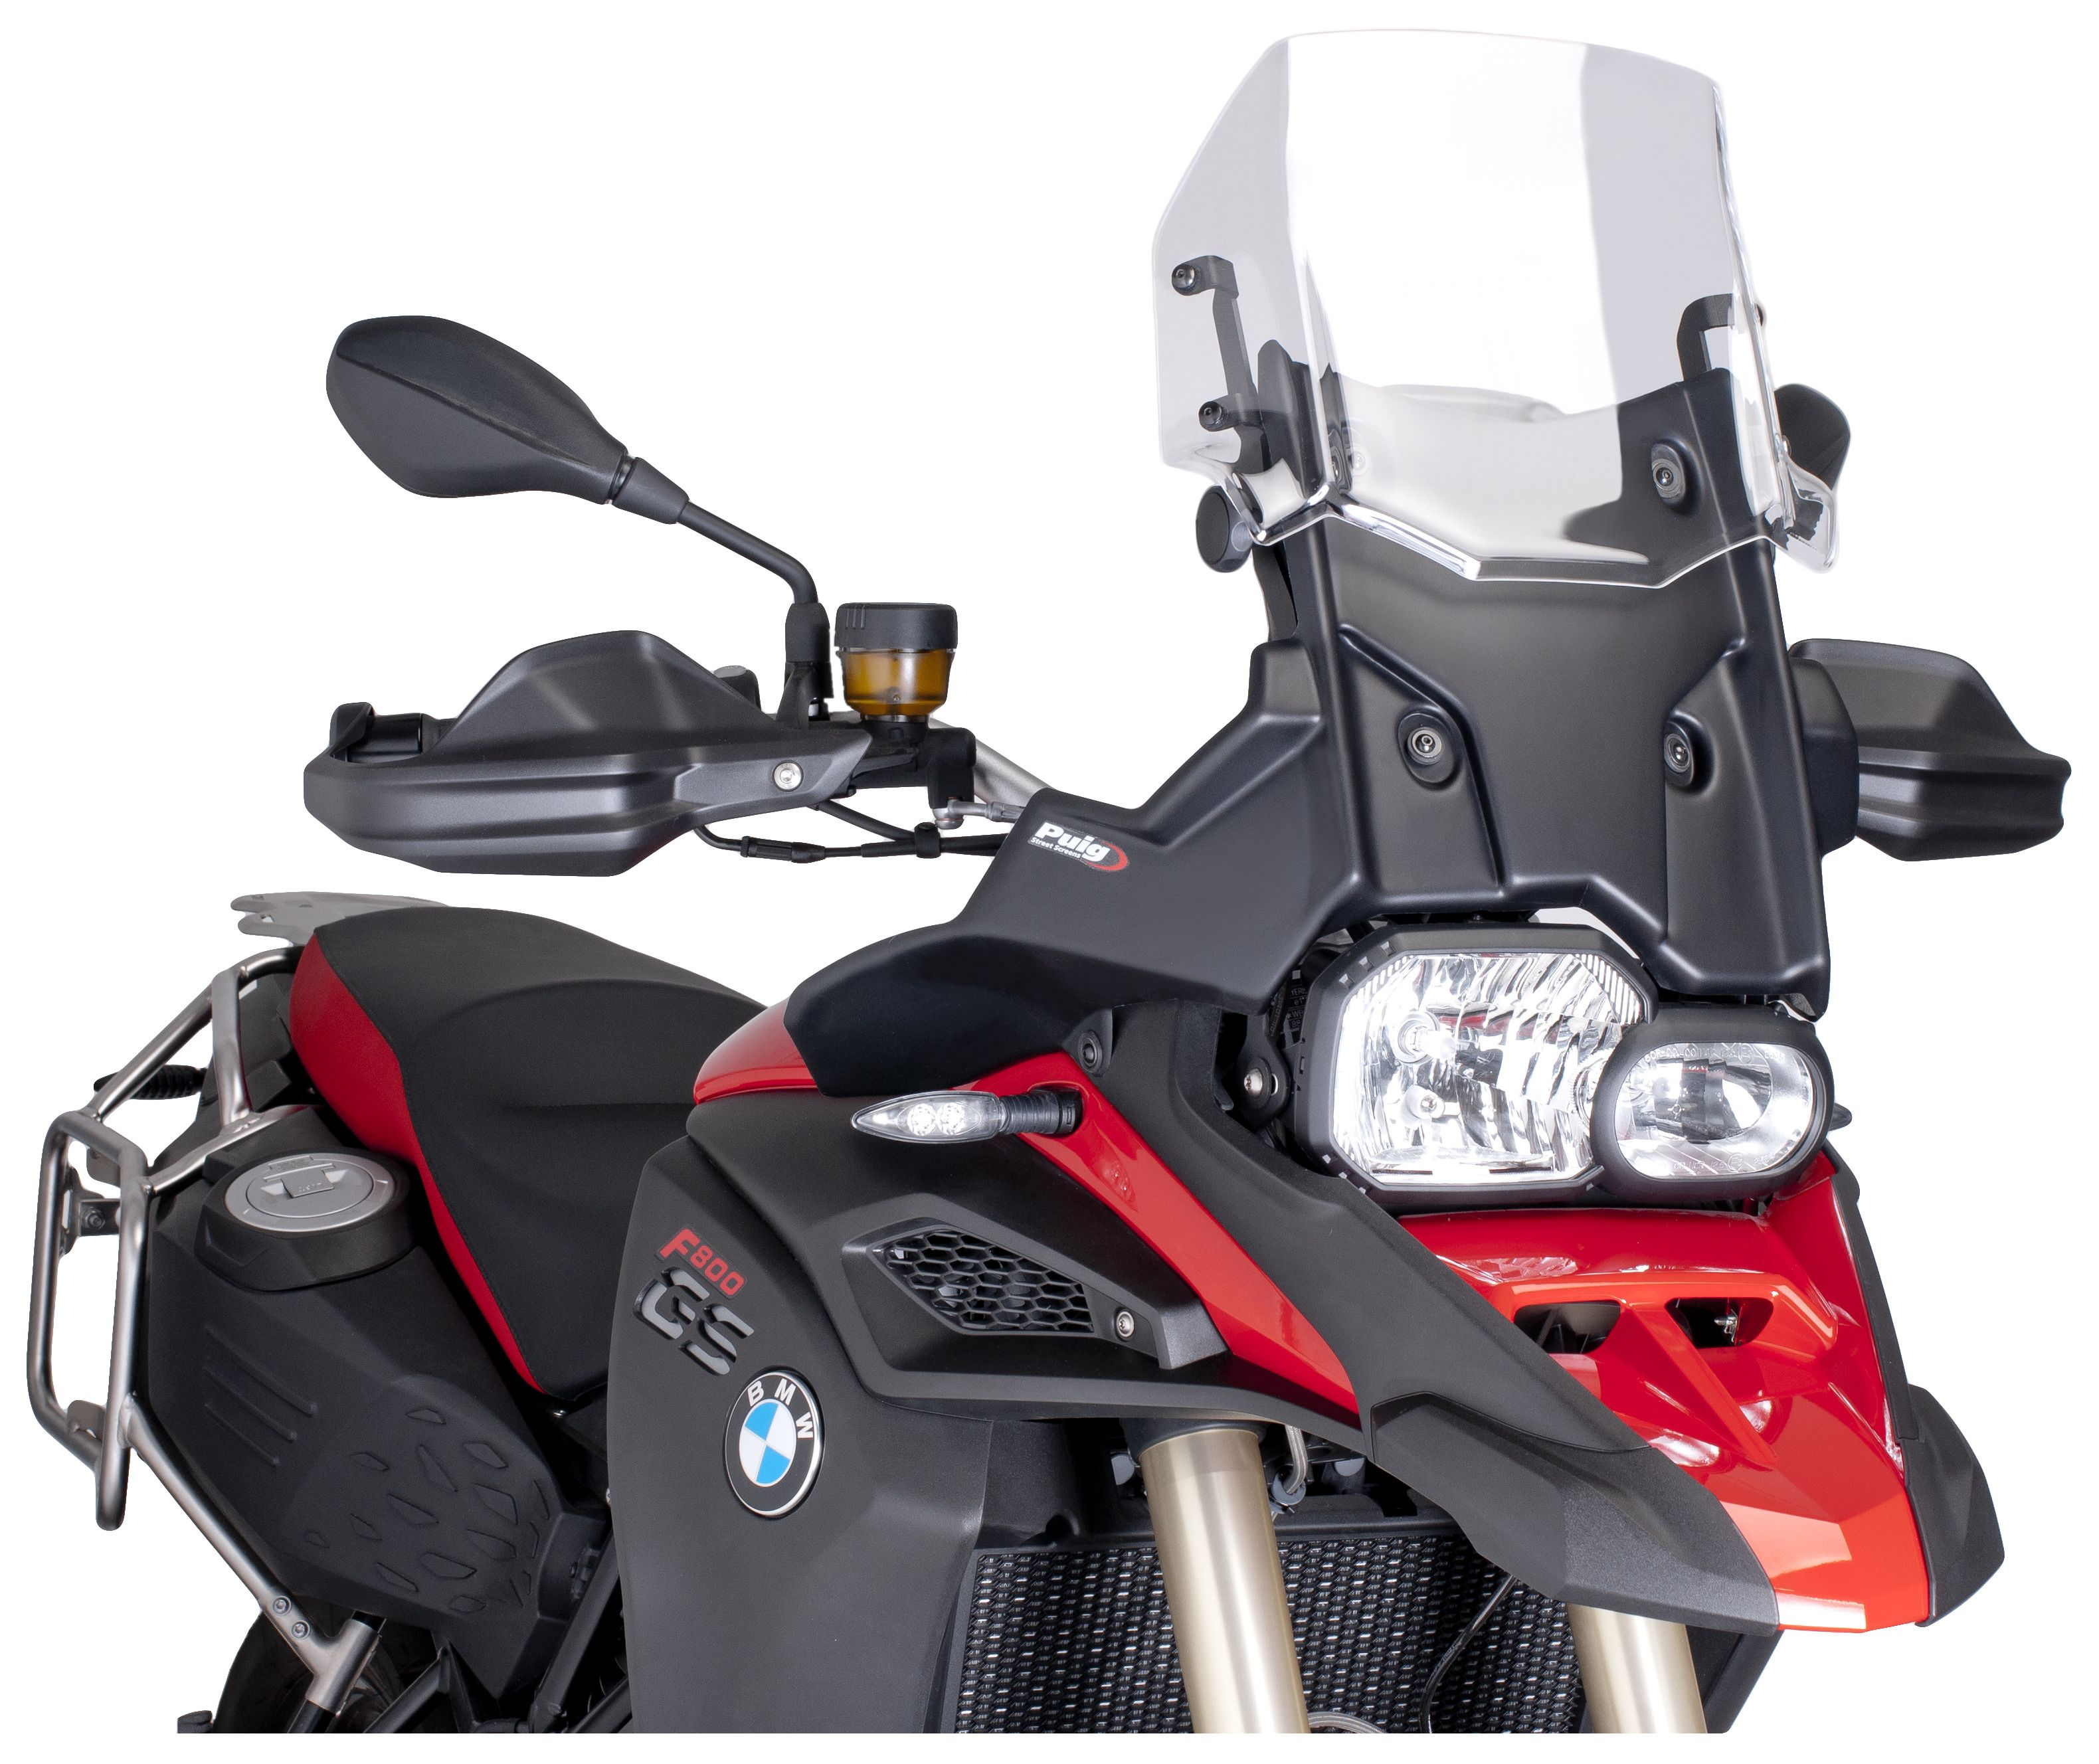 Puig Touring Windscreen BMW F800GS Adventure 2013-2016